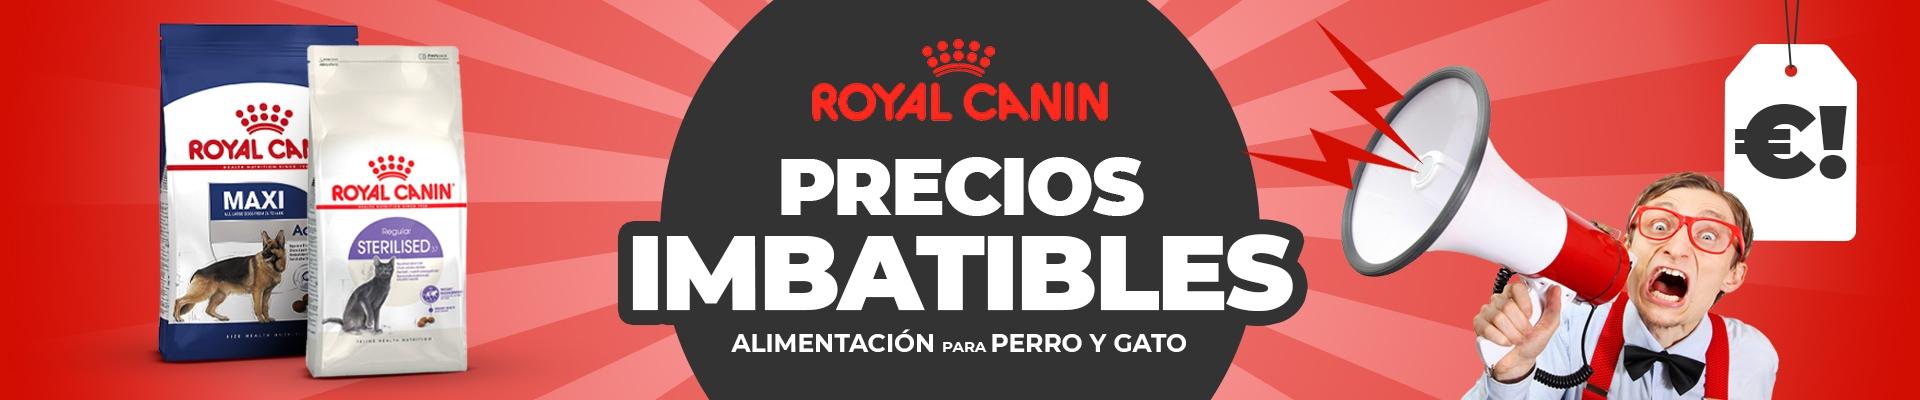 Precios imbatibles Royal Canin